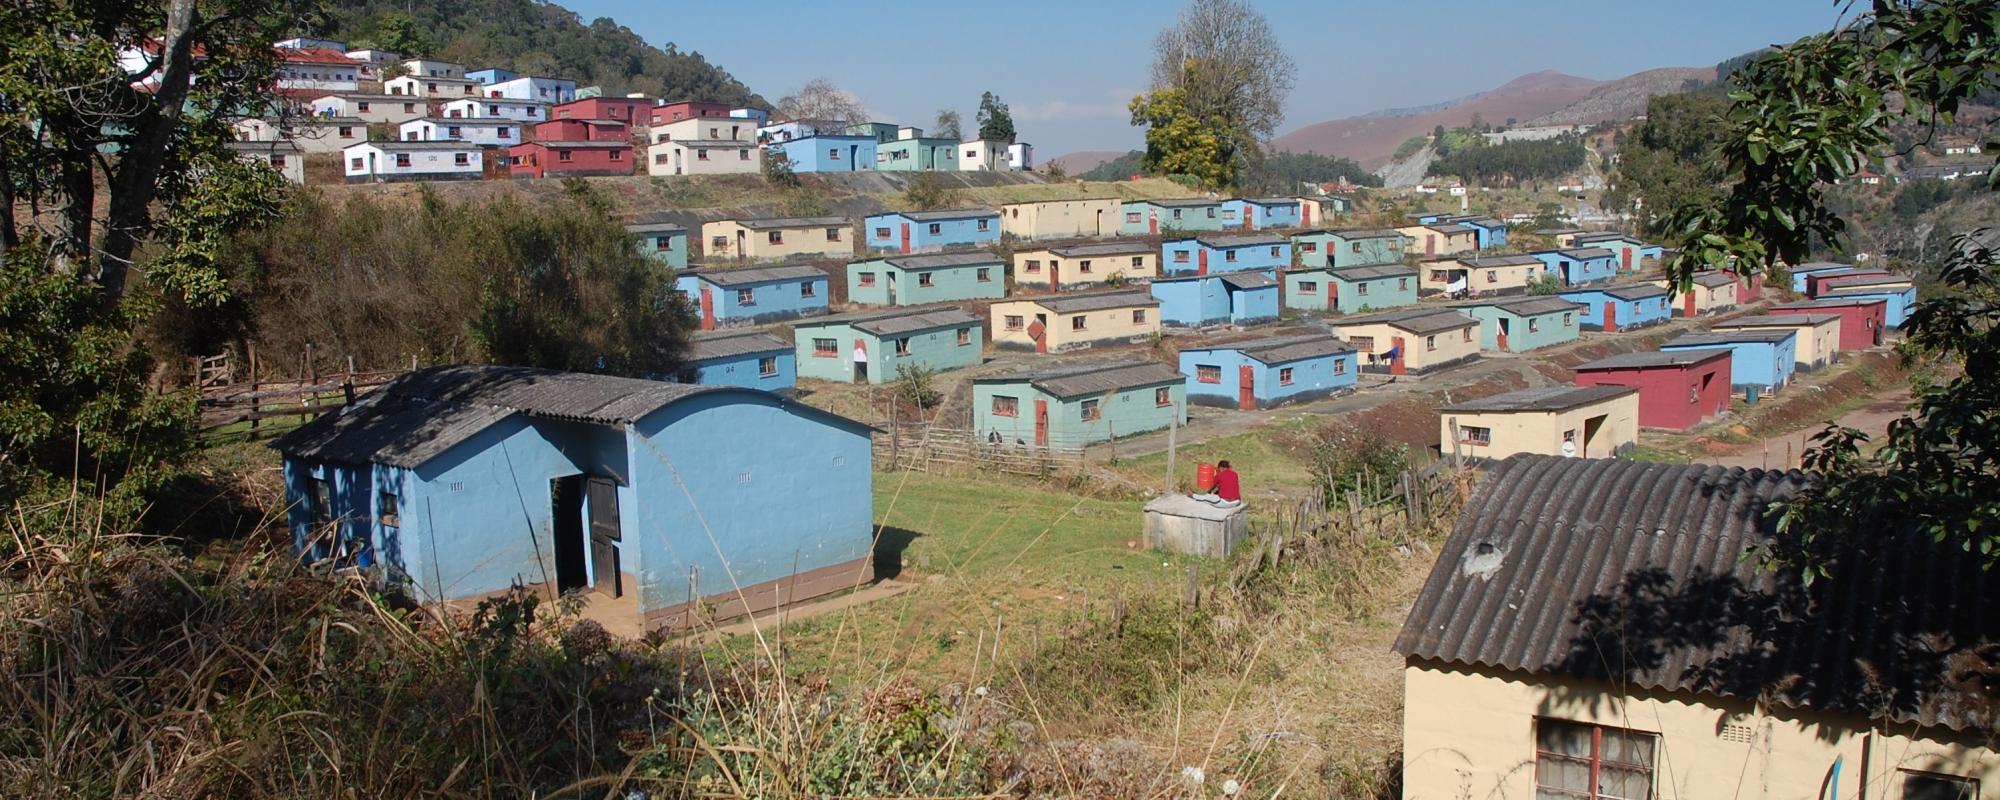 Bulembu village